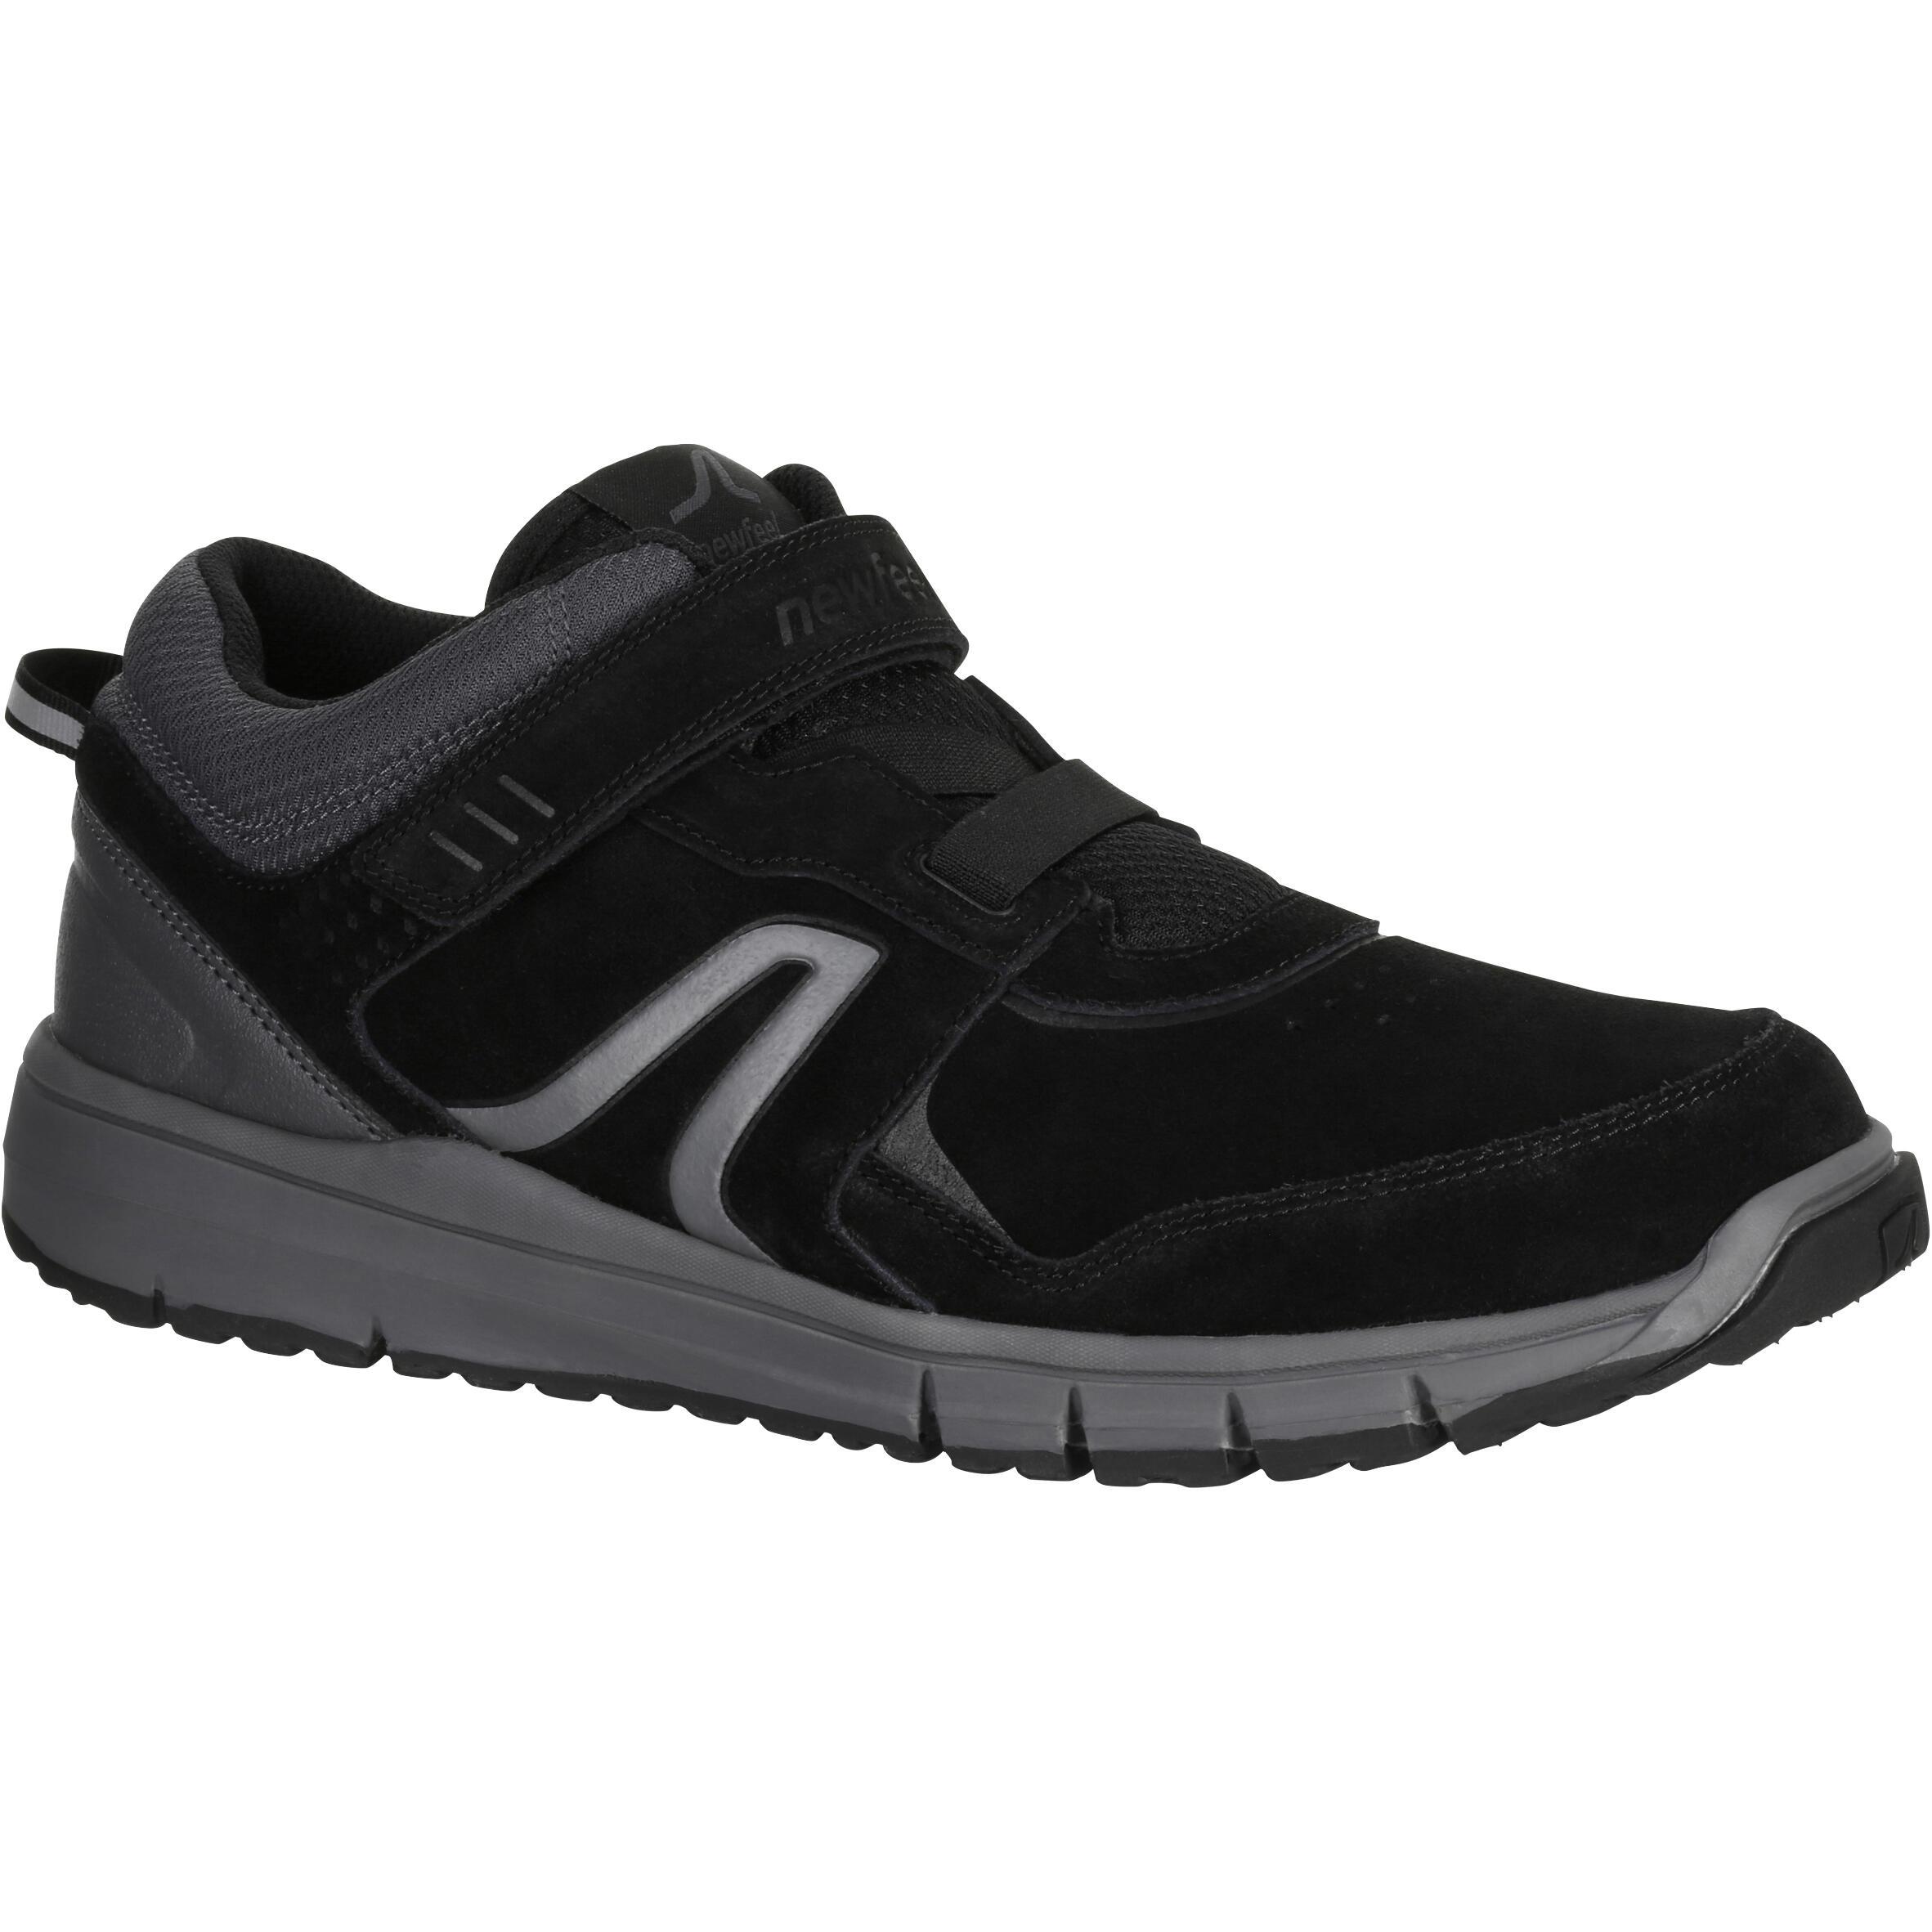 hommes walking chaussures noir cuir. Black Bedroom Furniture Sets. Home Design Ideas